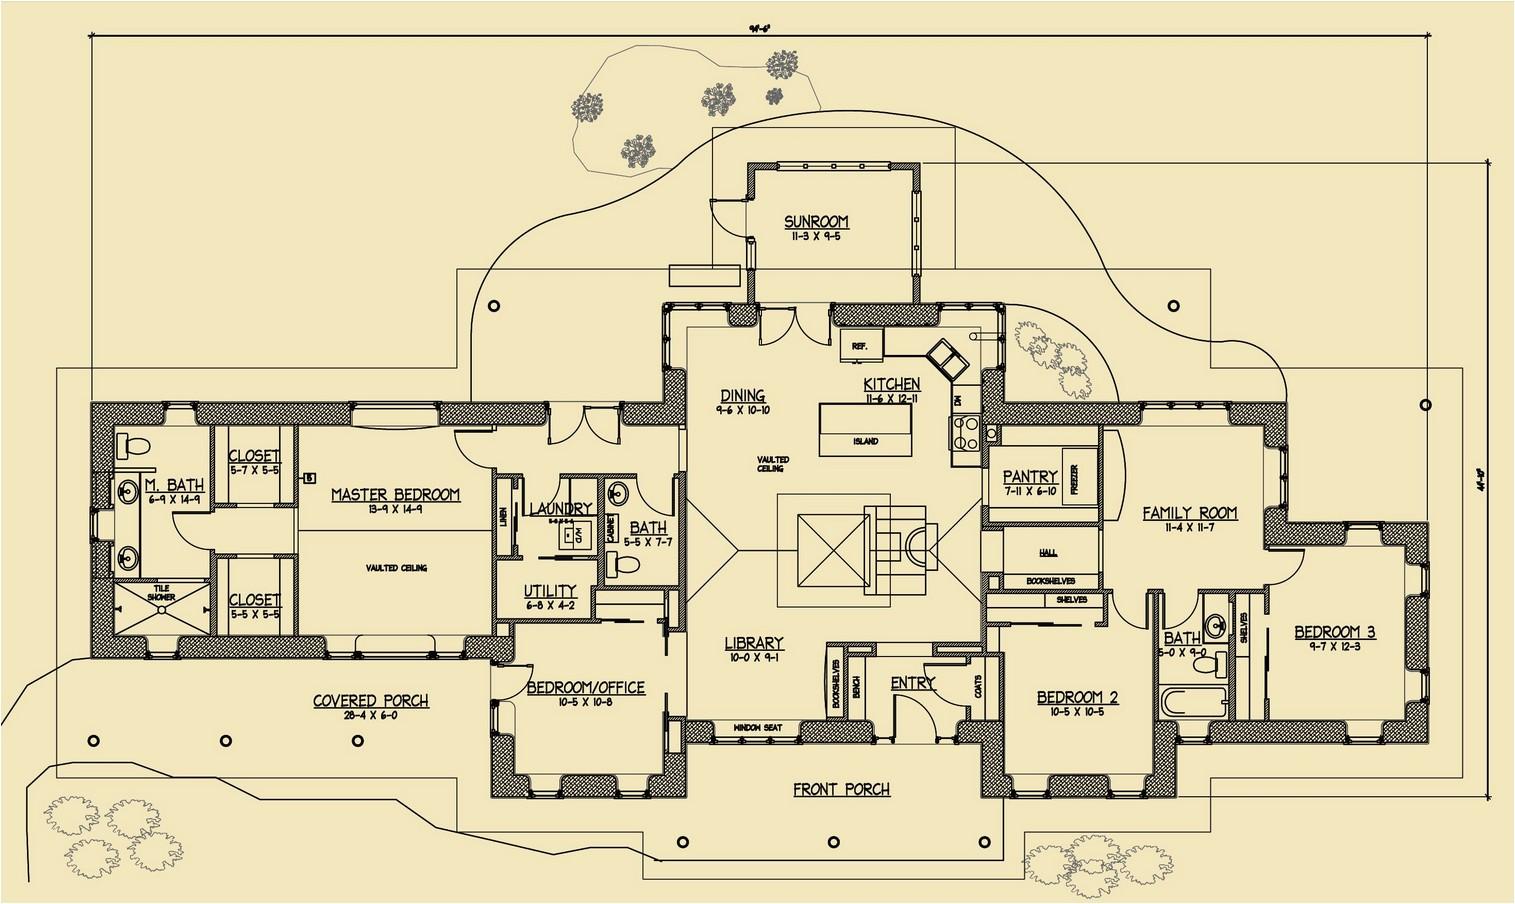 Strawbale Home Plans Rustic Family Straw Bale Plans Strawbale Com